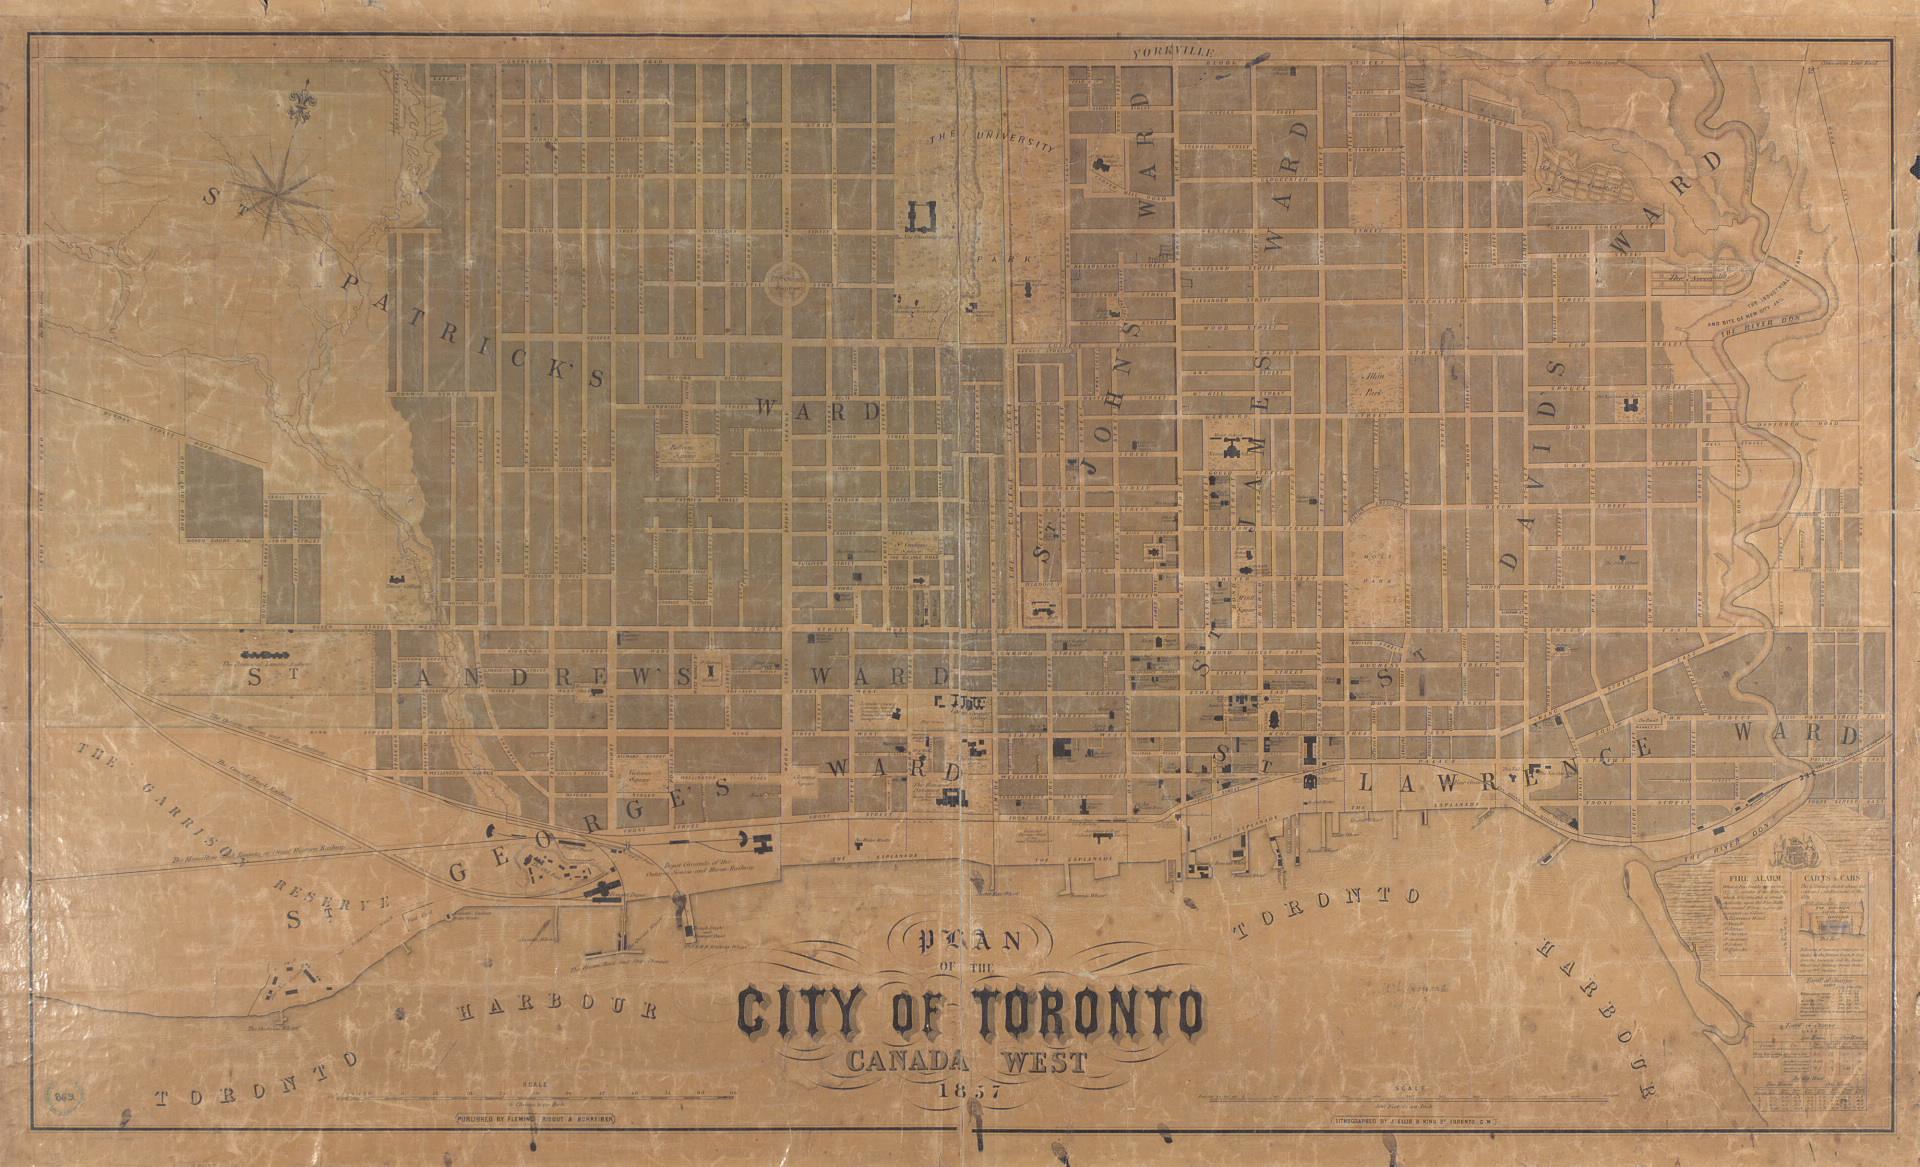 University Of Toronto Map Library HGIS workshop material by Marcel Fortin, University of Toronto Map